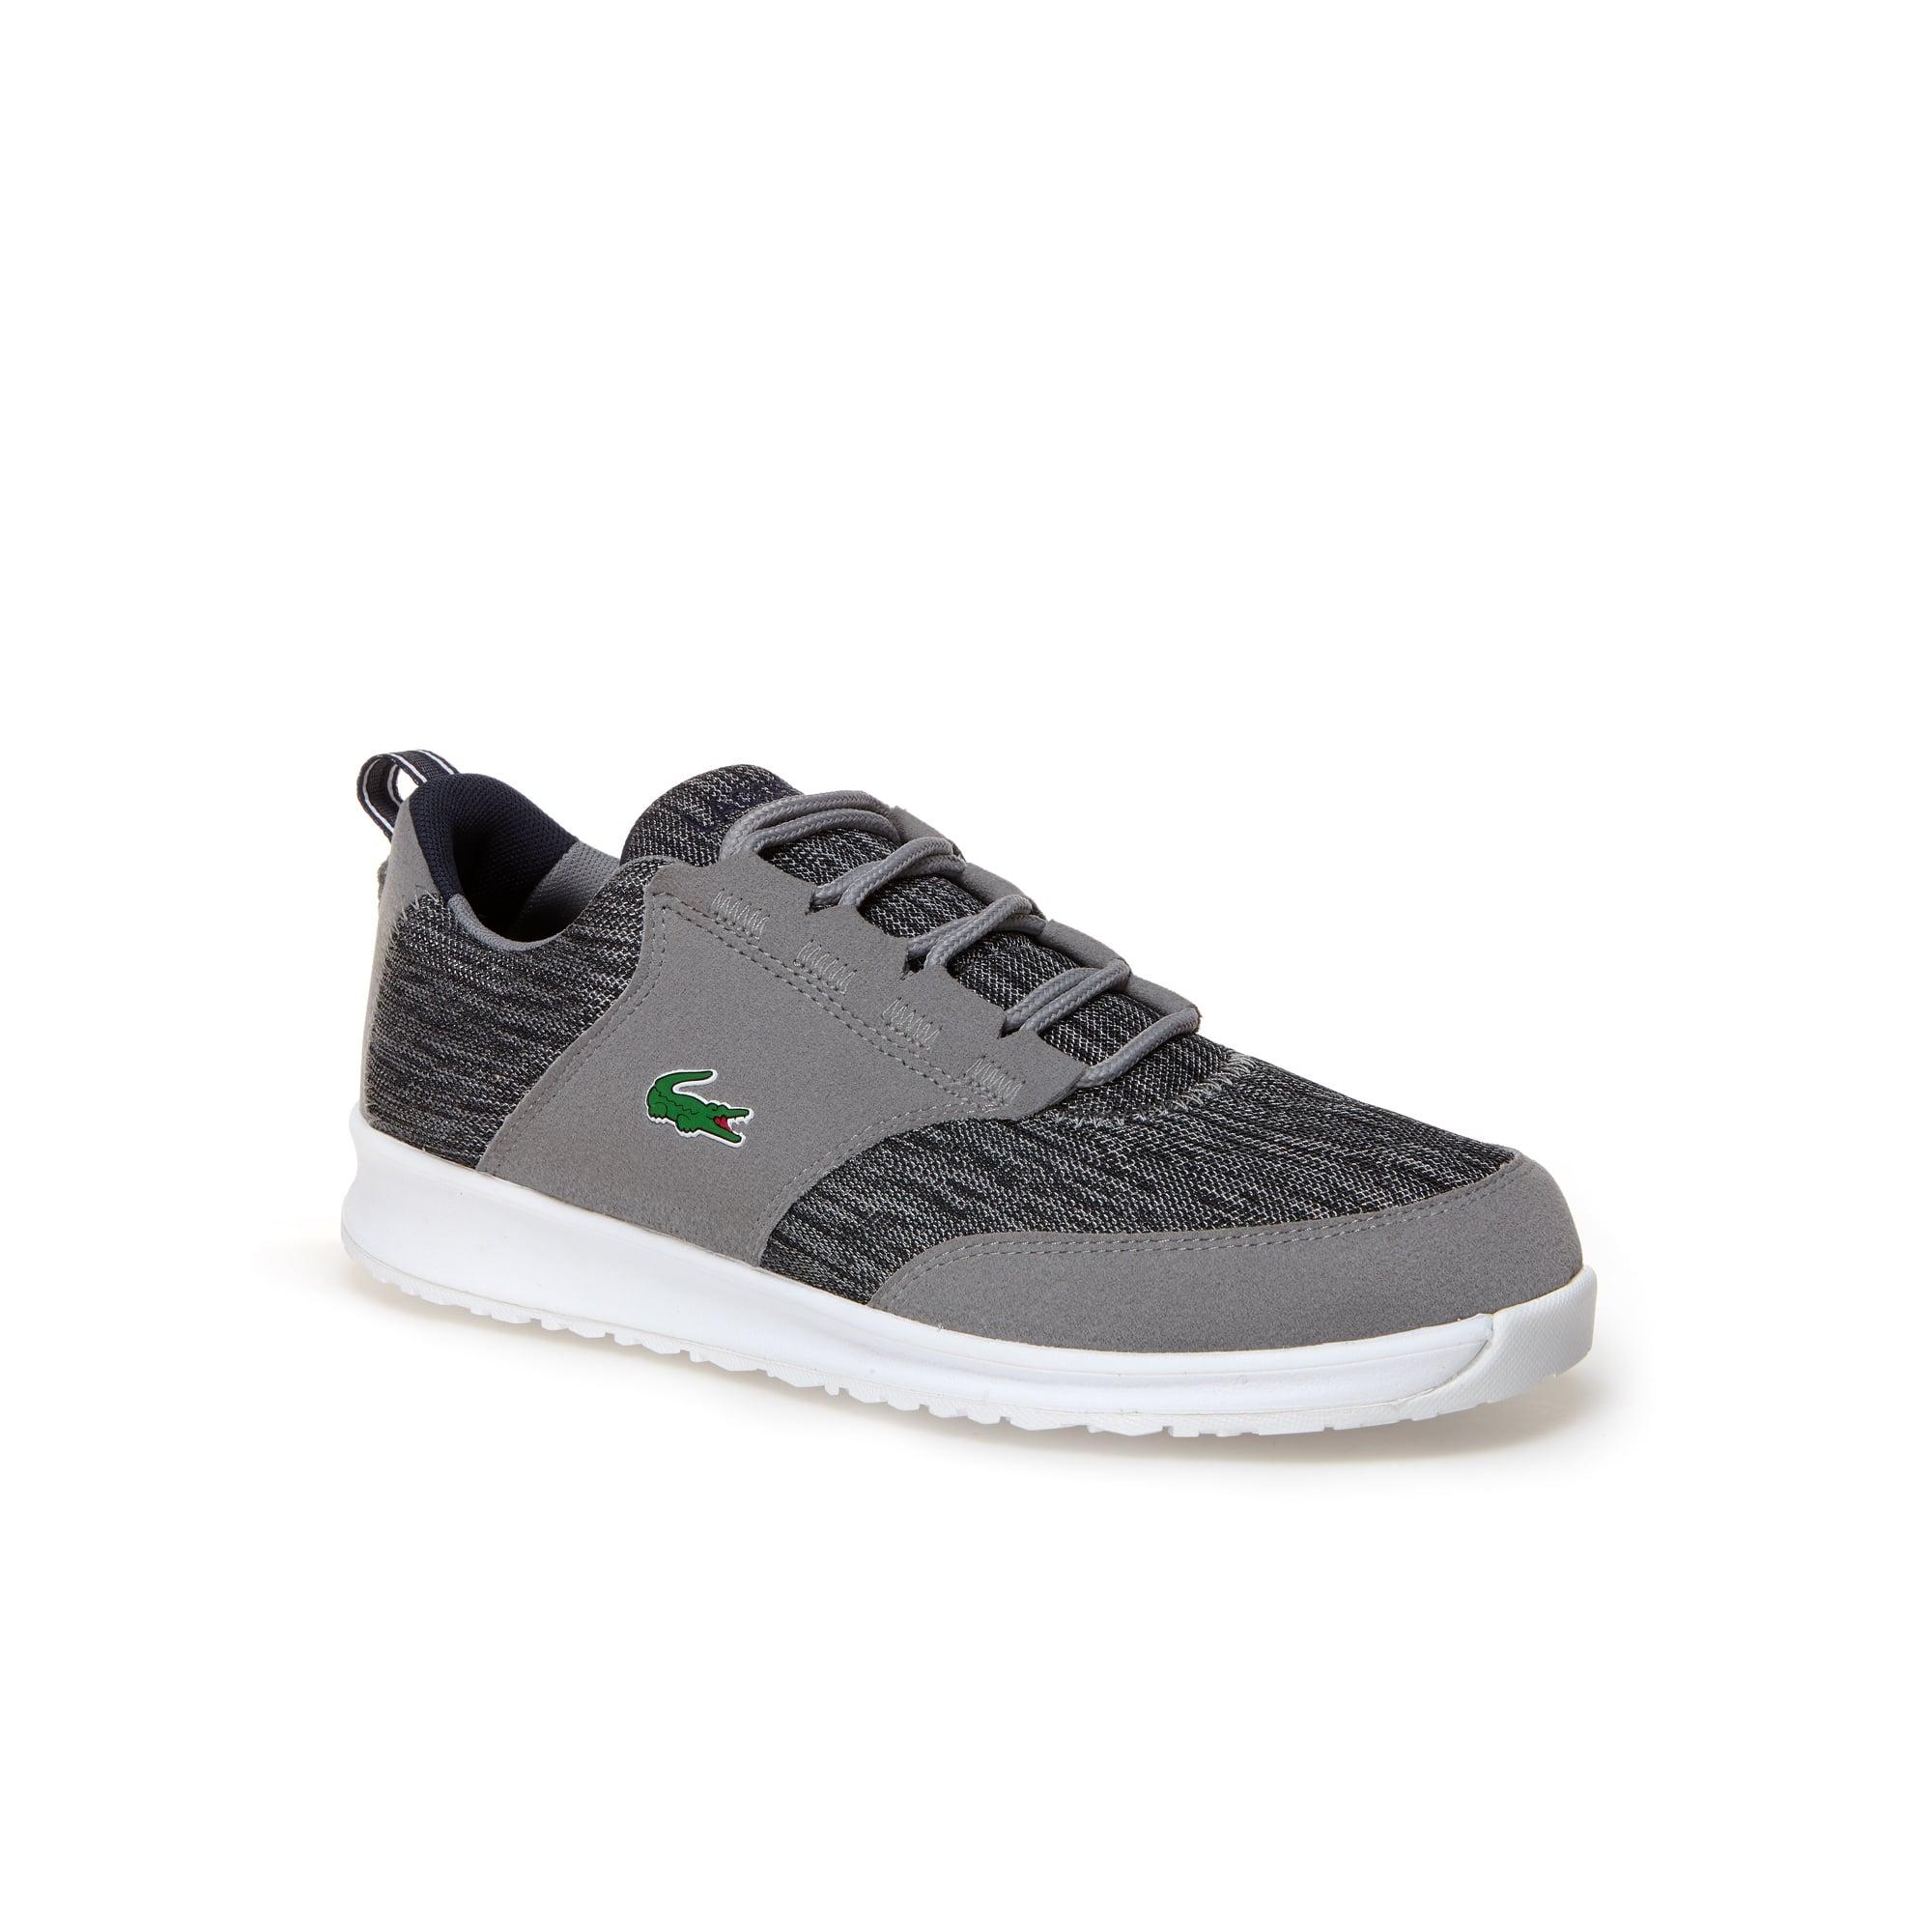 Sneakers Ado L.ight en textile